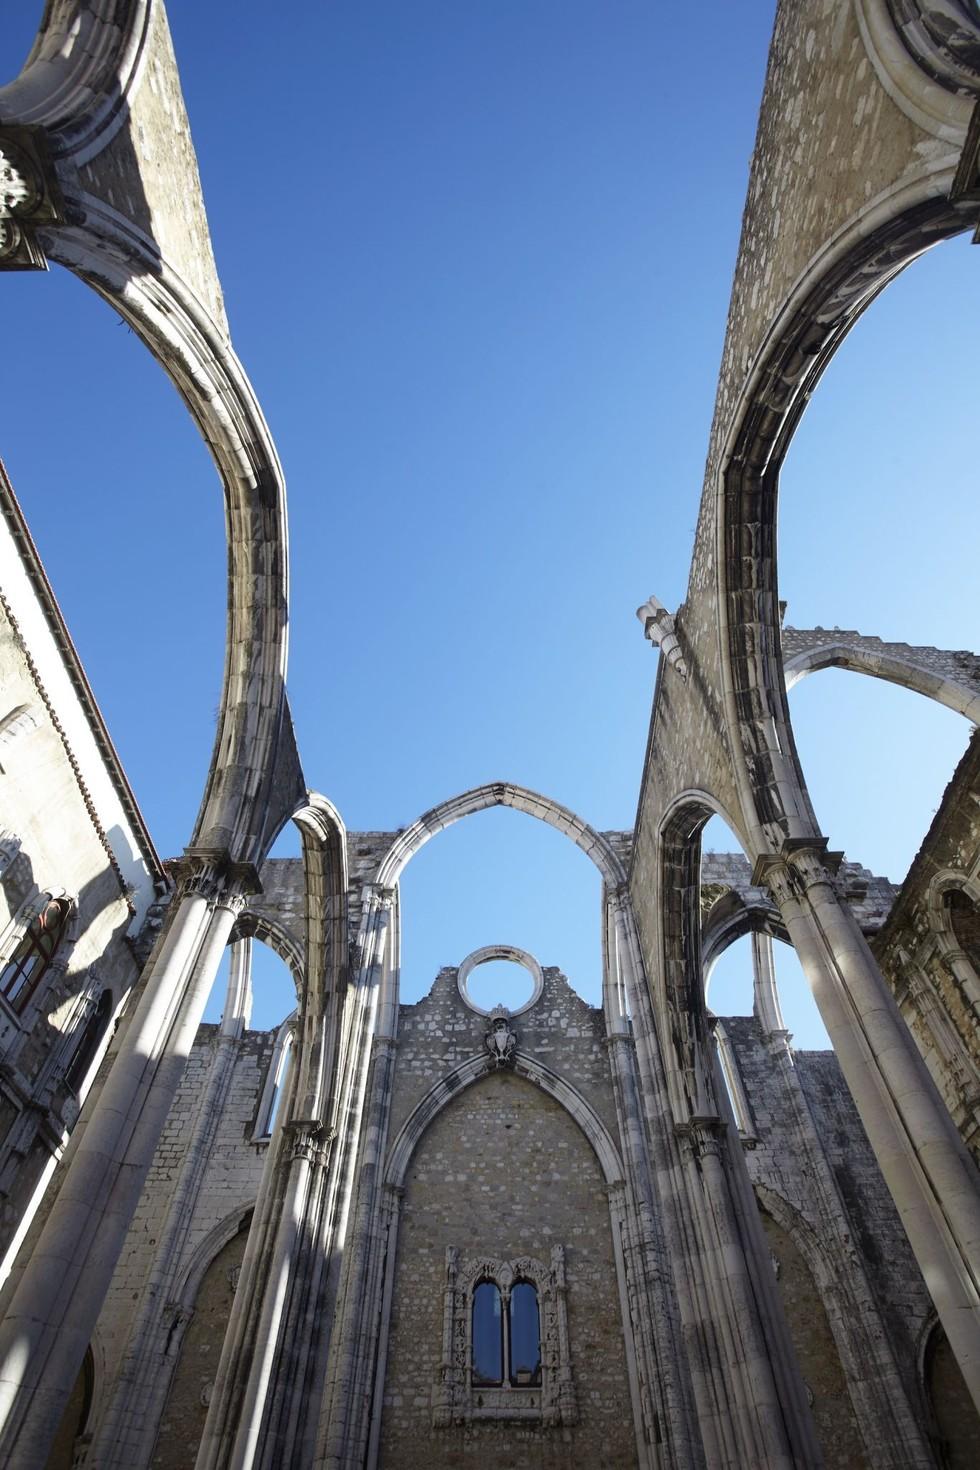 The ruins of the Convento da Ordem do Carmo